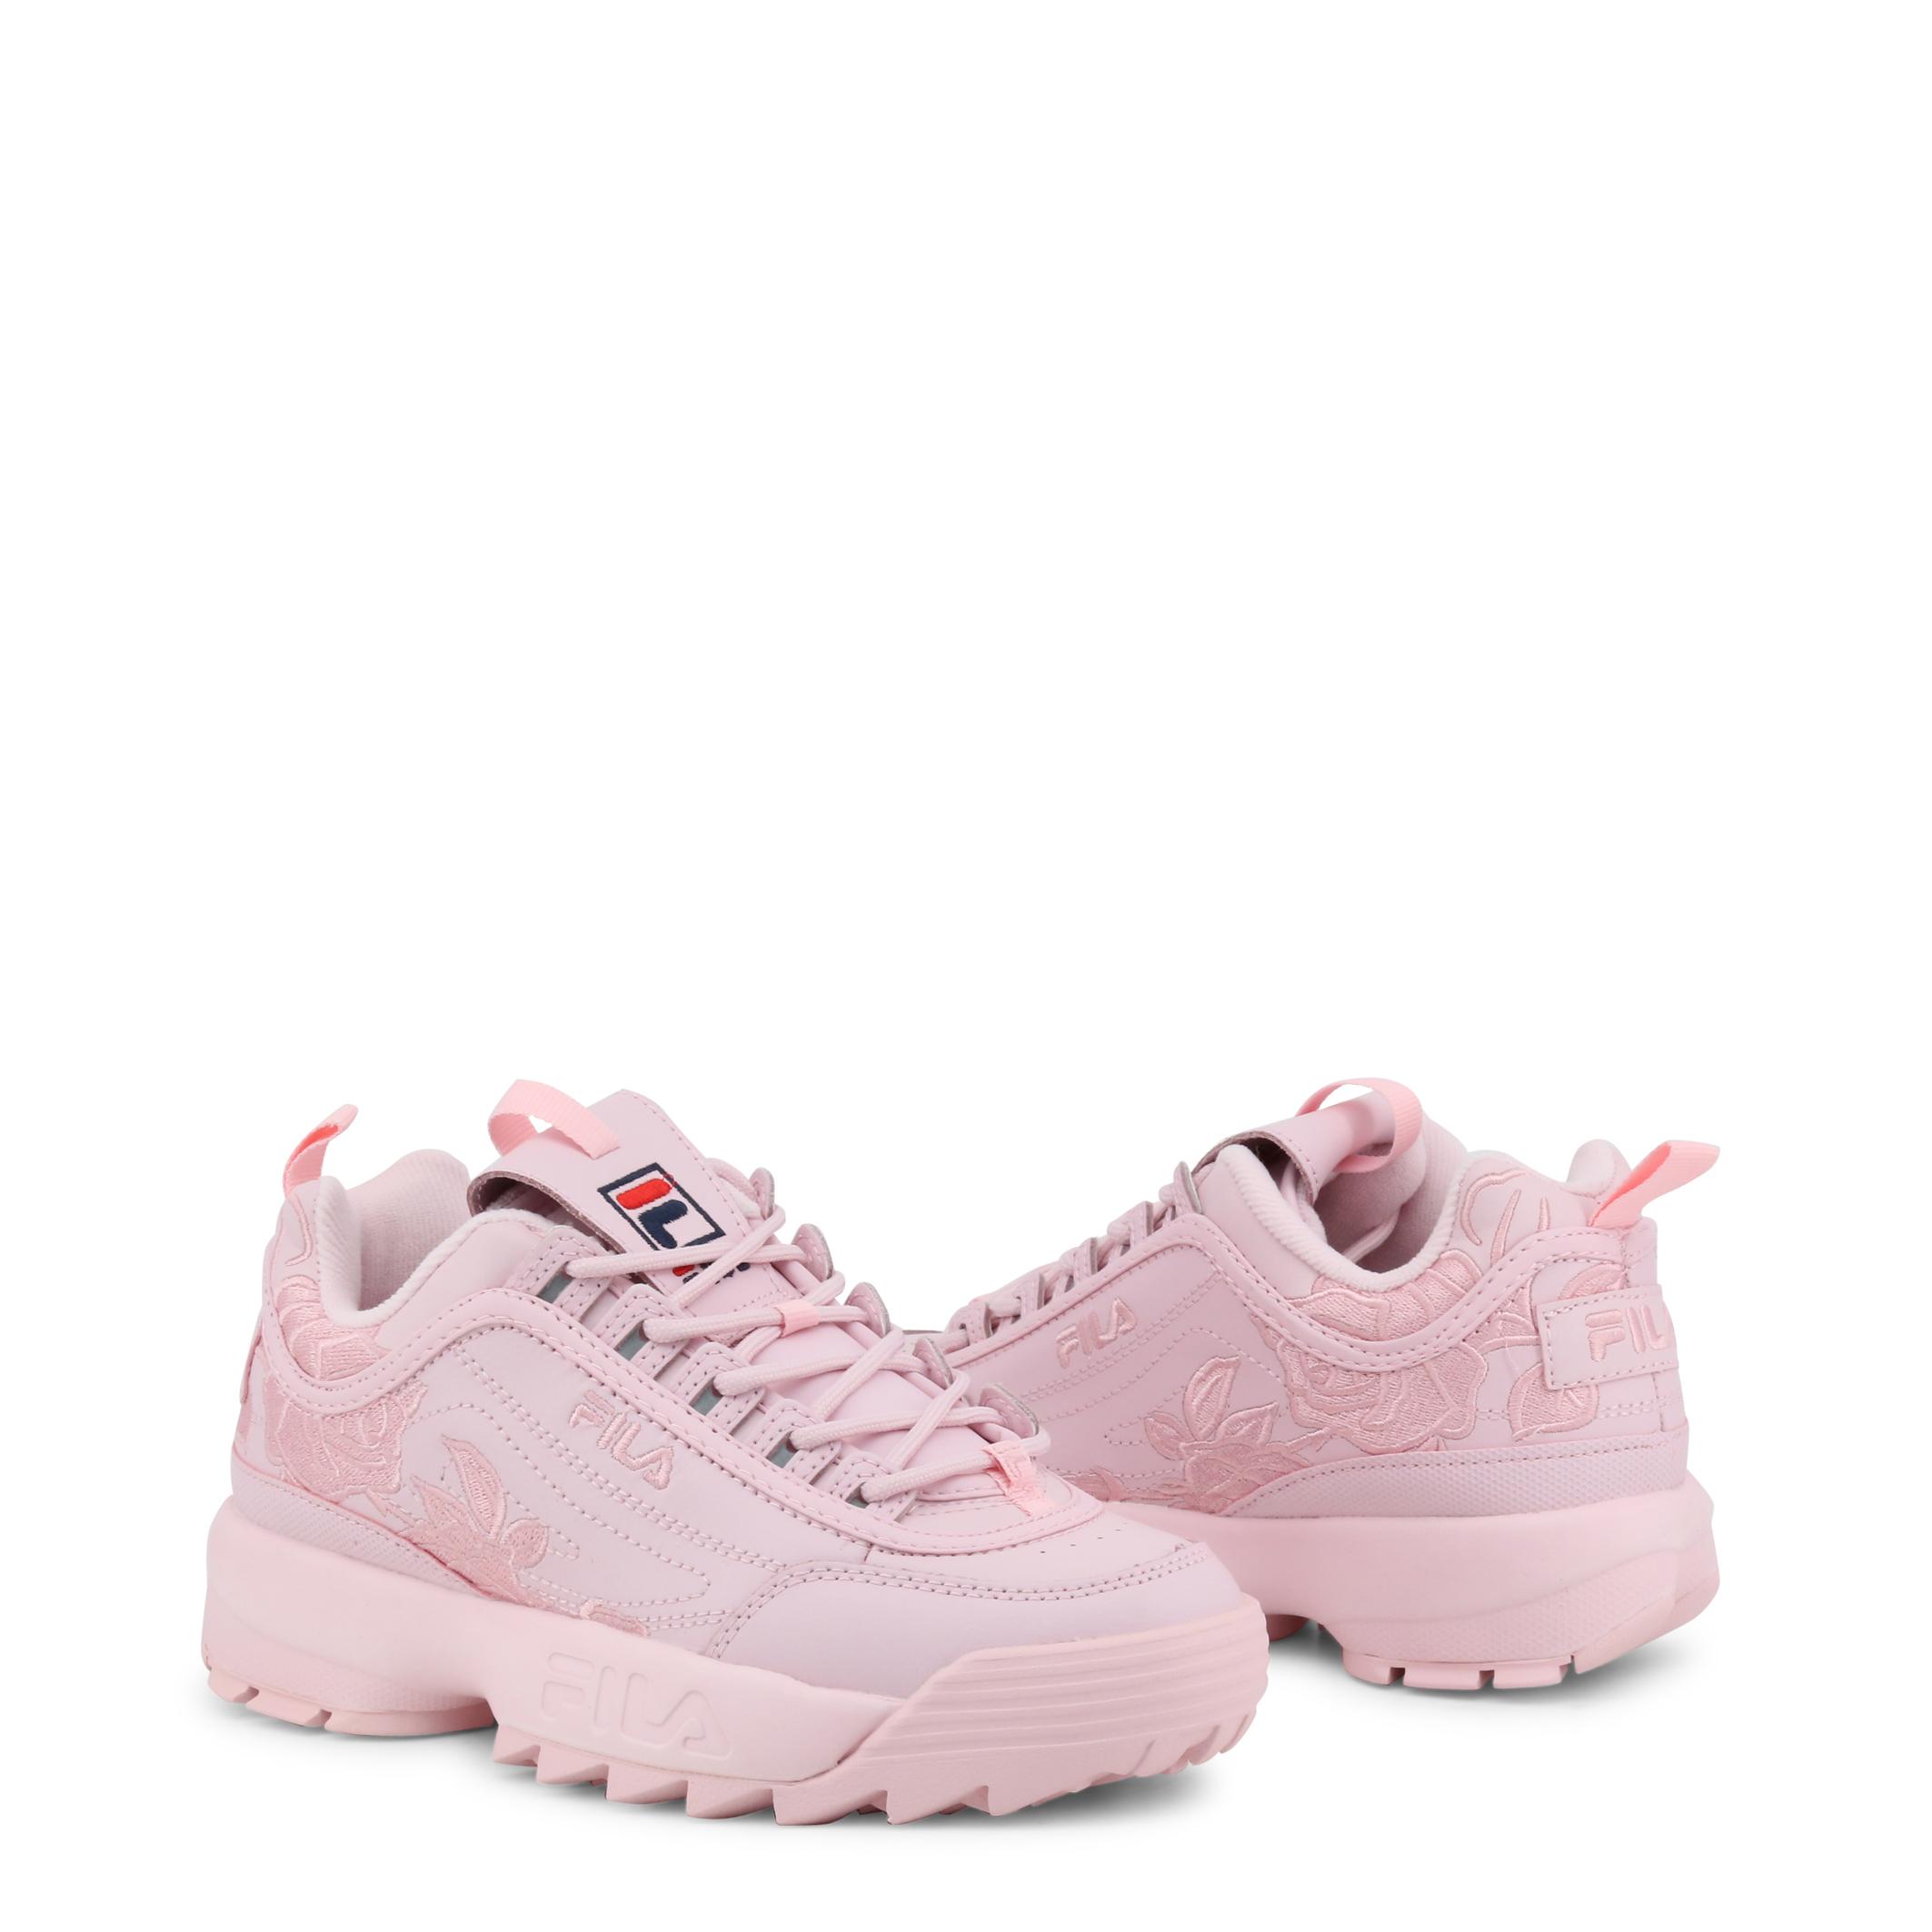 Details zu Fila Schuhe DISRUPTOR 2, Damen Sneakers Gelb/Weiß/Weiß/Rosa